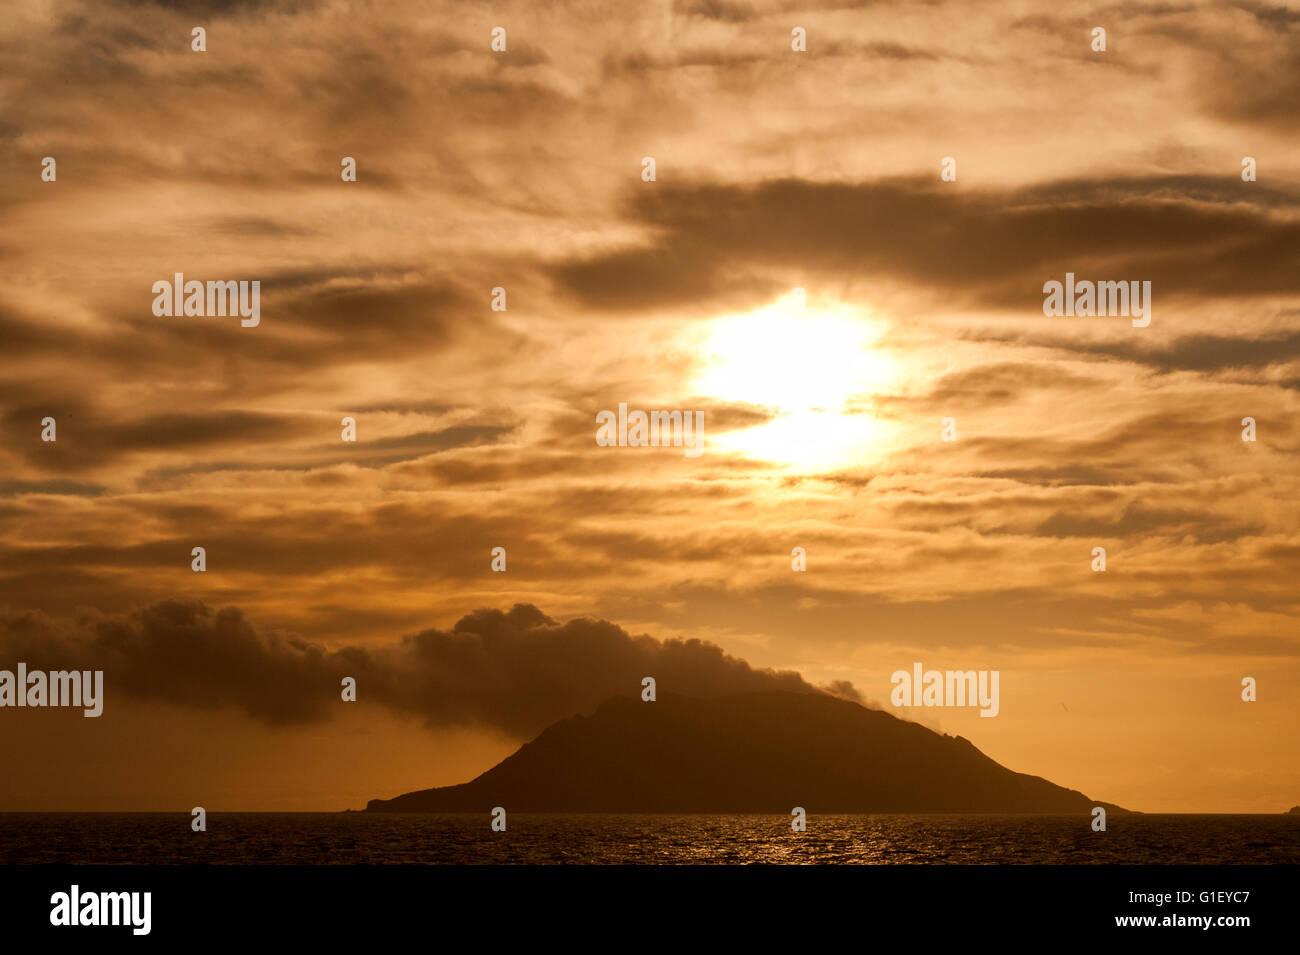 Amanecer sobre un volcán activo Whakaari Isla Blanca Nueva Zelanda Imagen De Stock